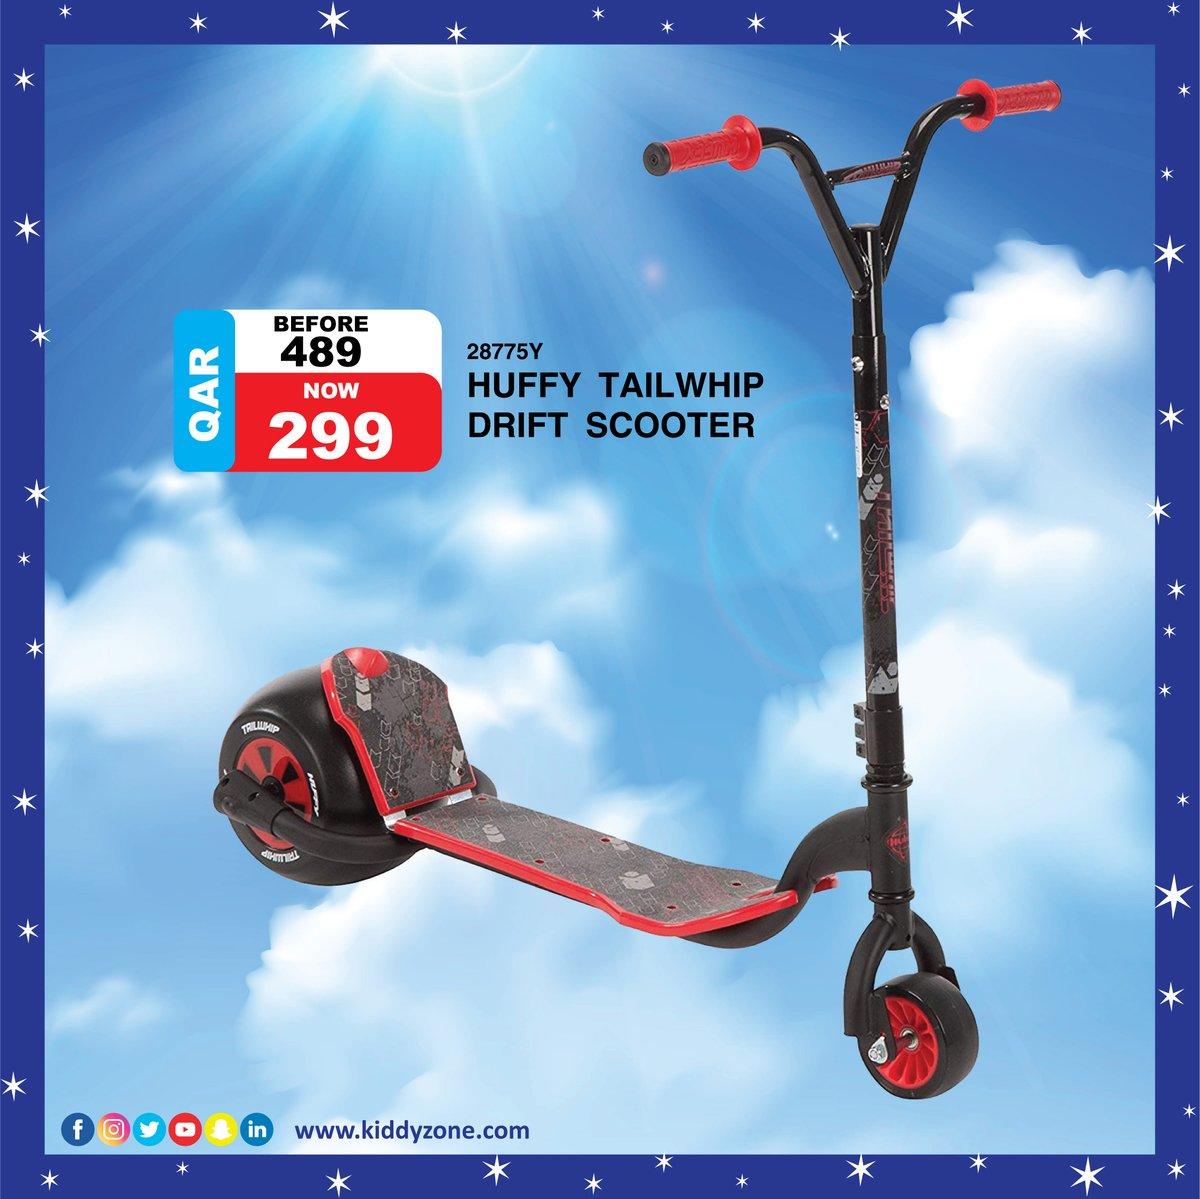 #toy #toys #shopping #Sale #locker #fun #Girls #Kids #qatarlife #dohaqatar #qatarmoms #luxury #luxuryqatar #BestQuality #Qatari #qatarinstagram